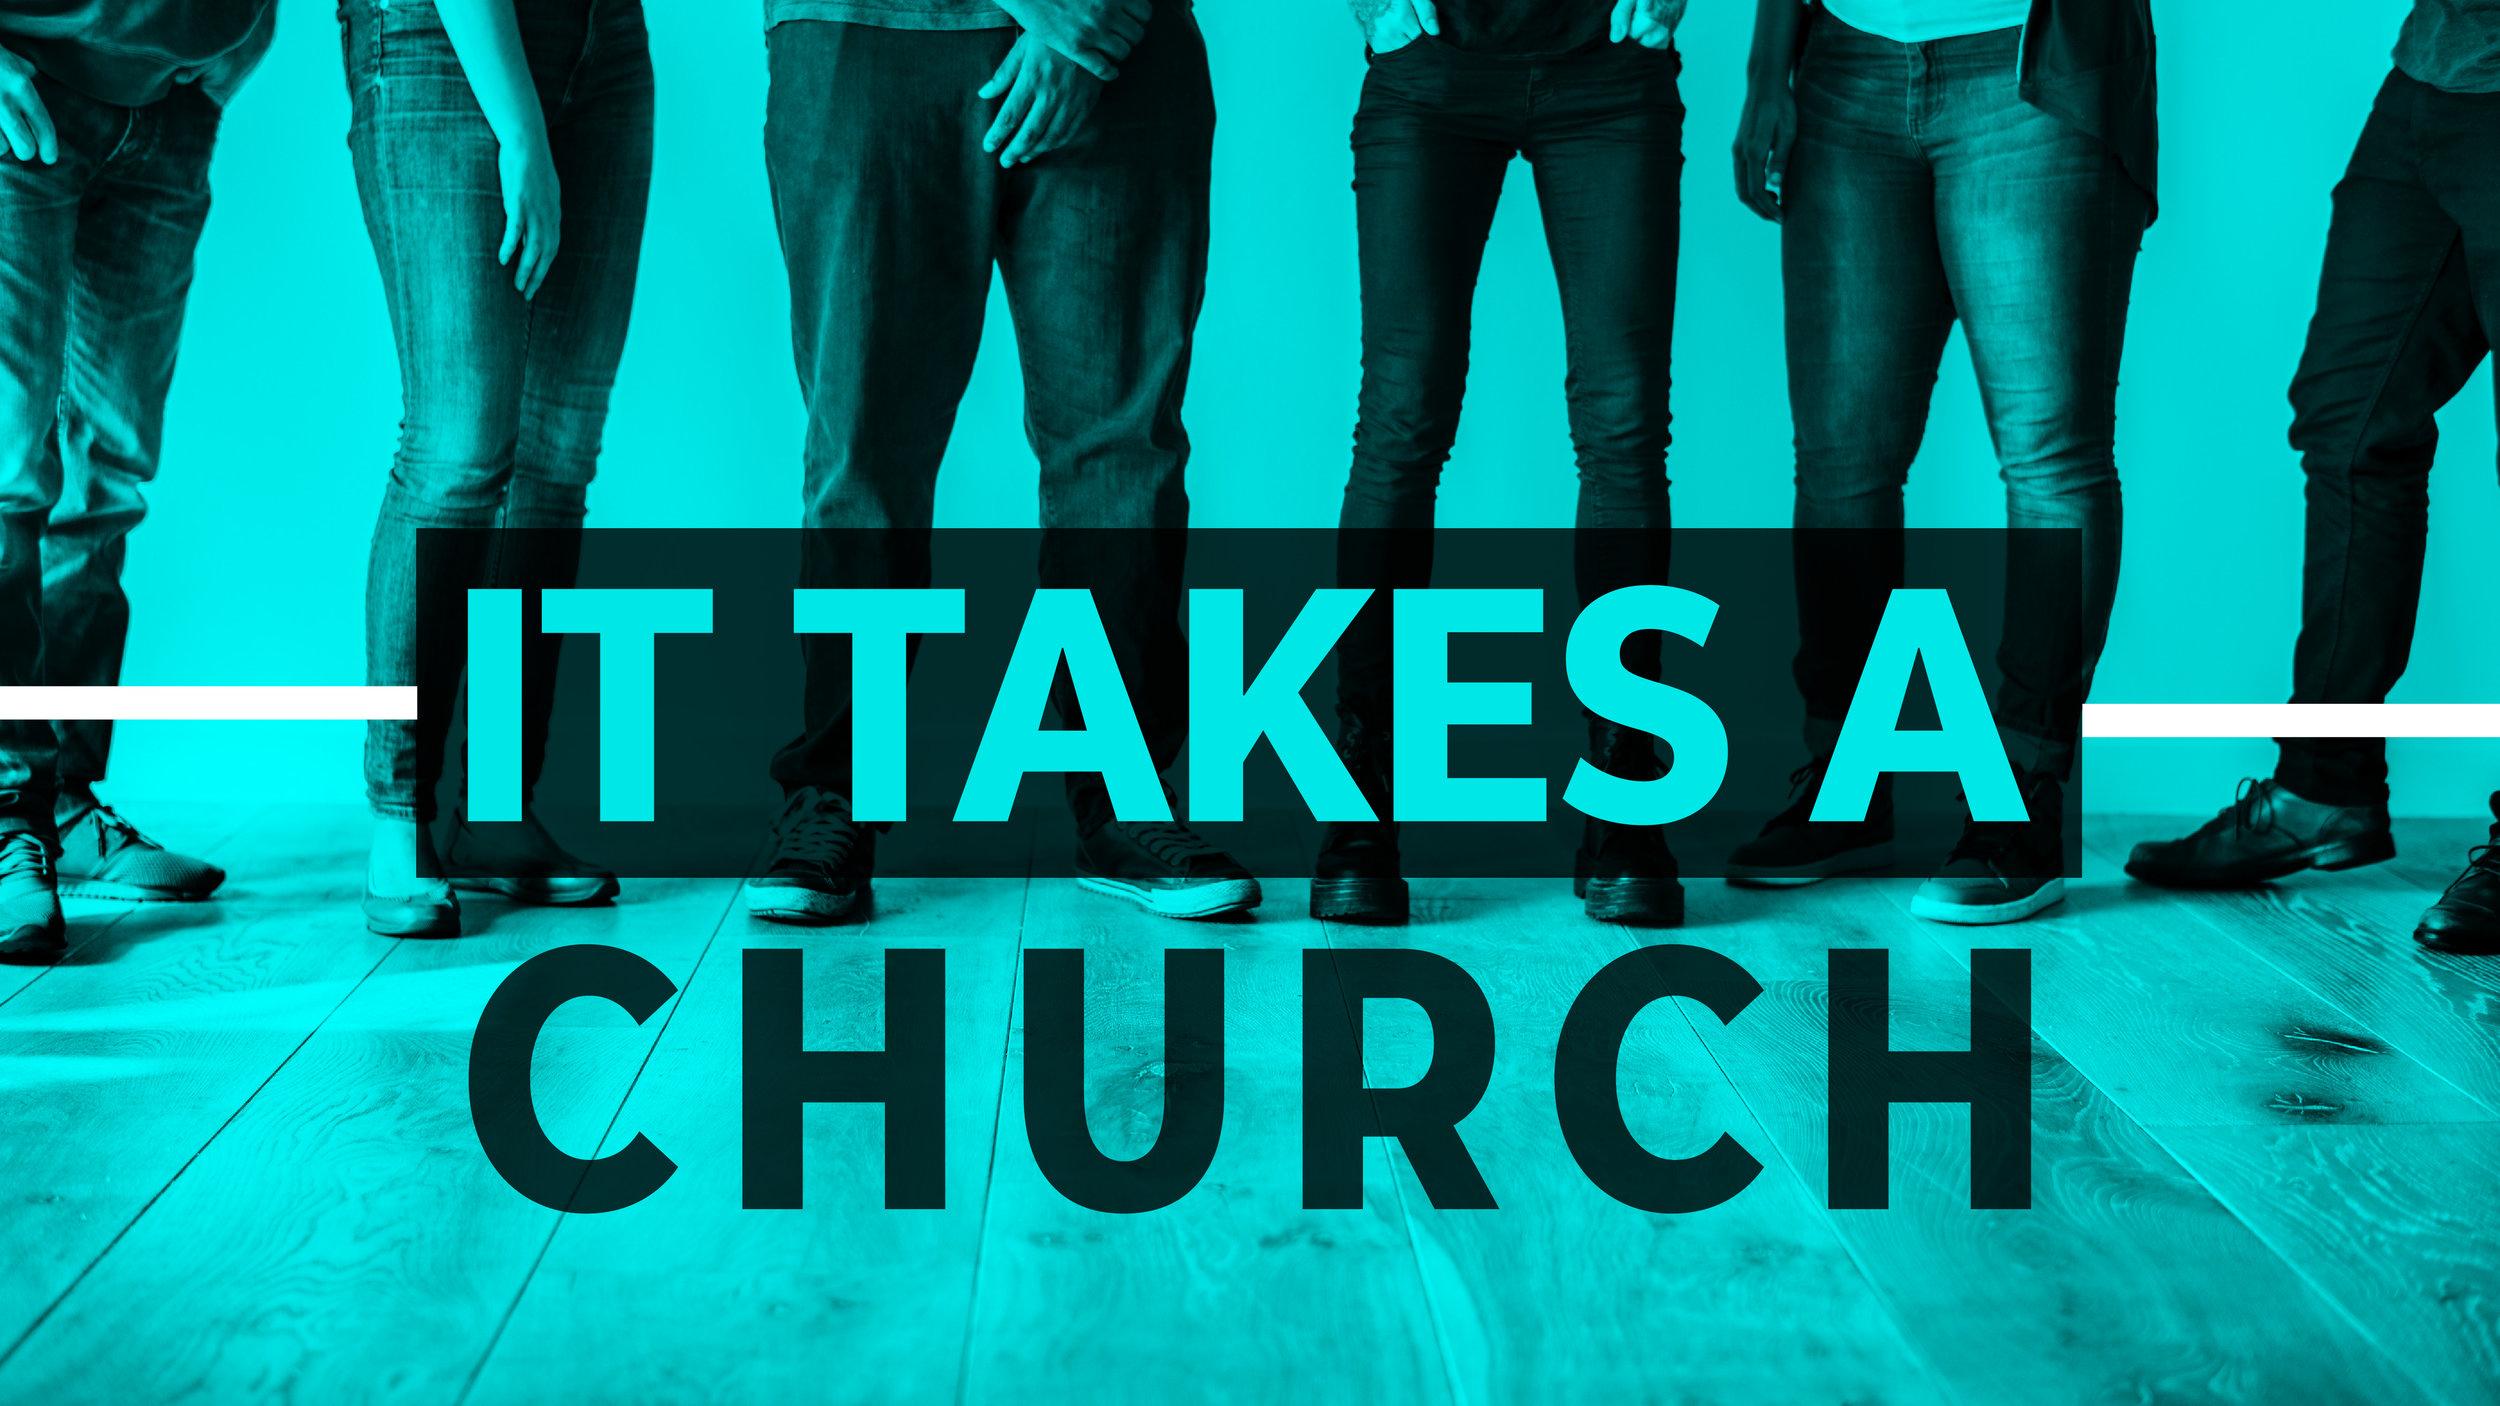 02-24-19 It Takes A Church_Slide-01.jpg